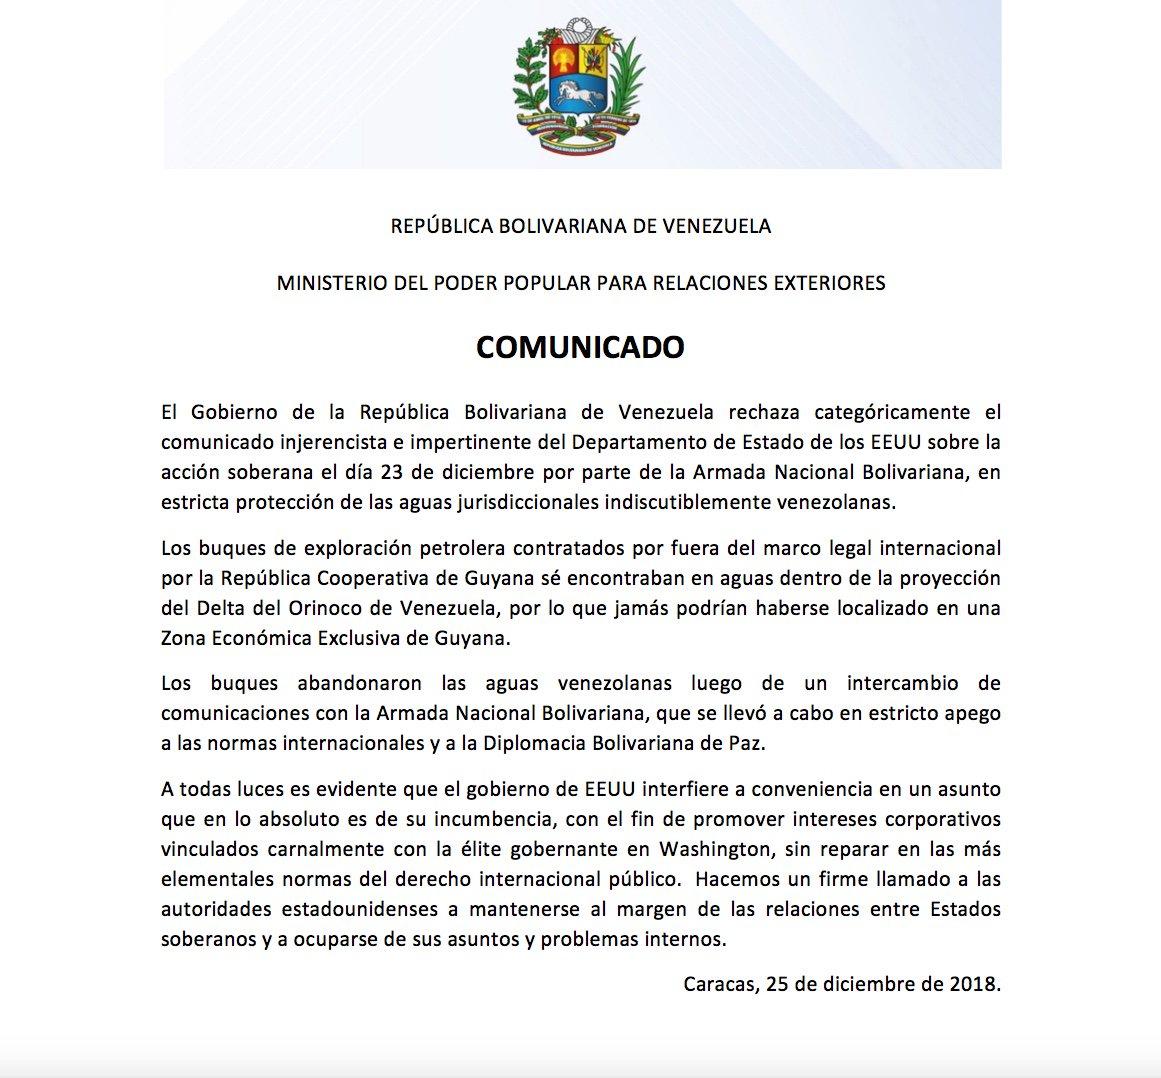 Tag guyana en El Foro Militar de Venezuela  DvRI-9IX0AAEtBV